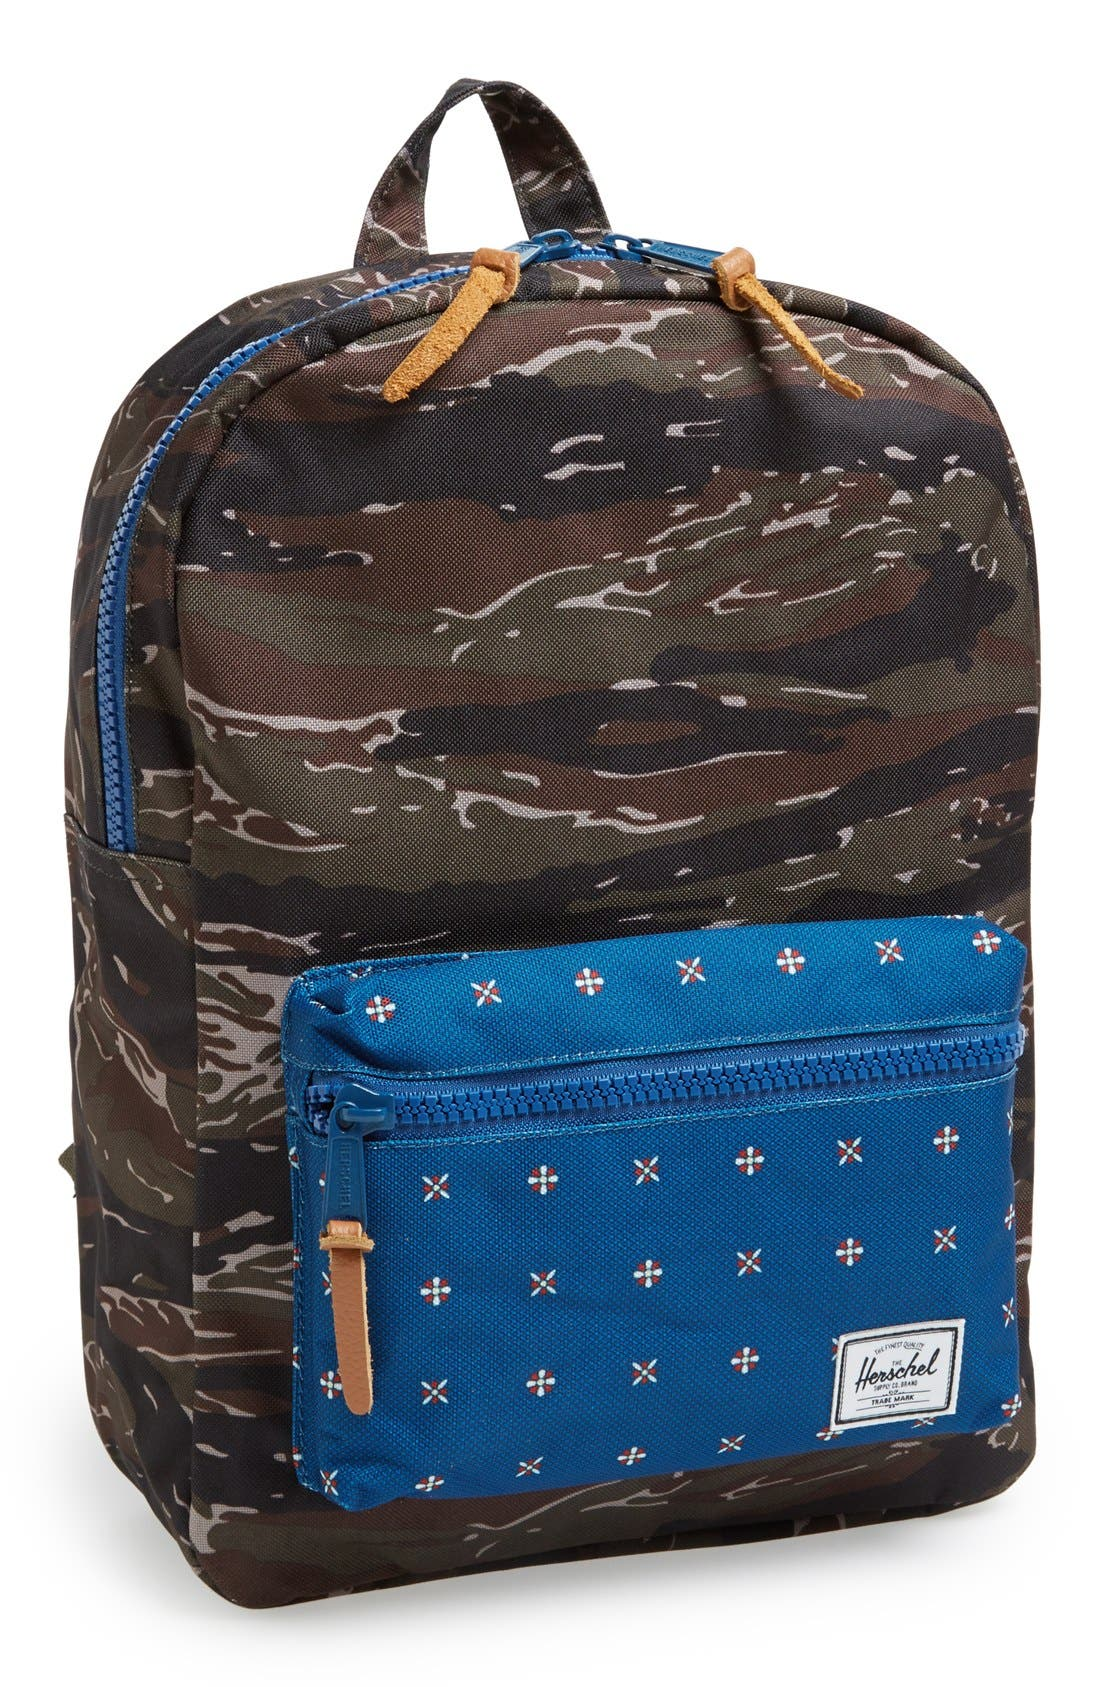 Alternate Image 1 Selected - Herschel Supply Co. 'Settlement' Tiger Camo Backpack (Boys)